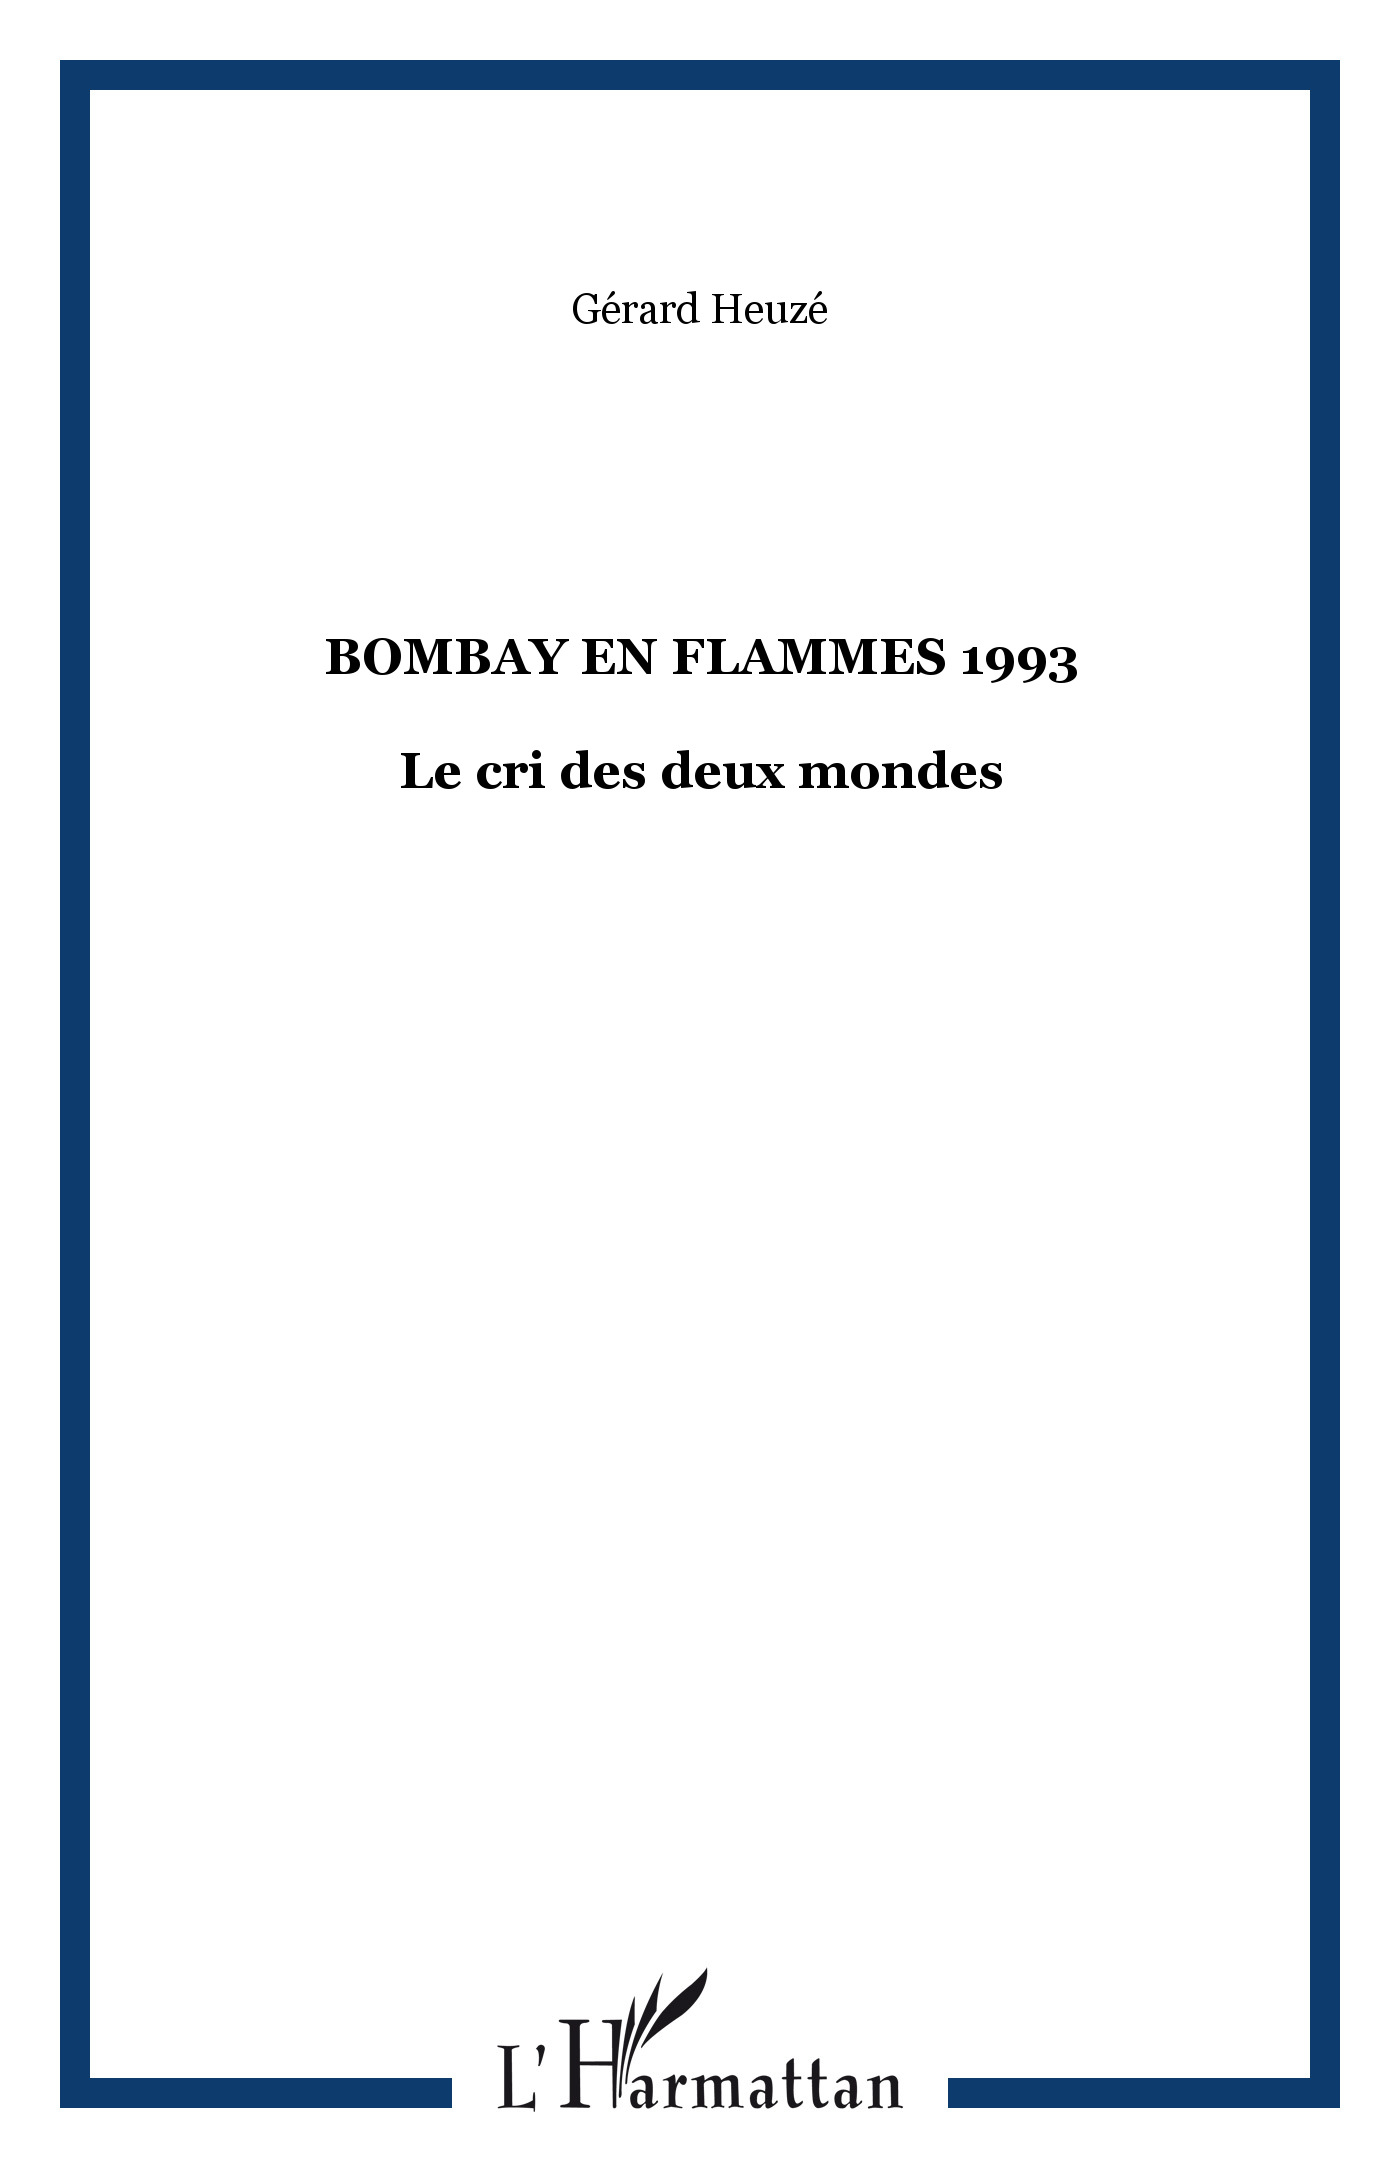 BOMBAY EN FLAMMES